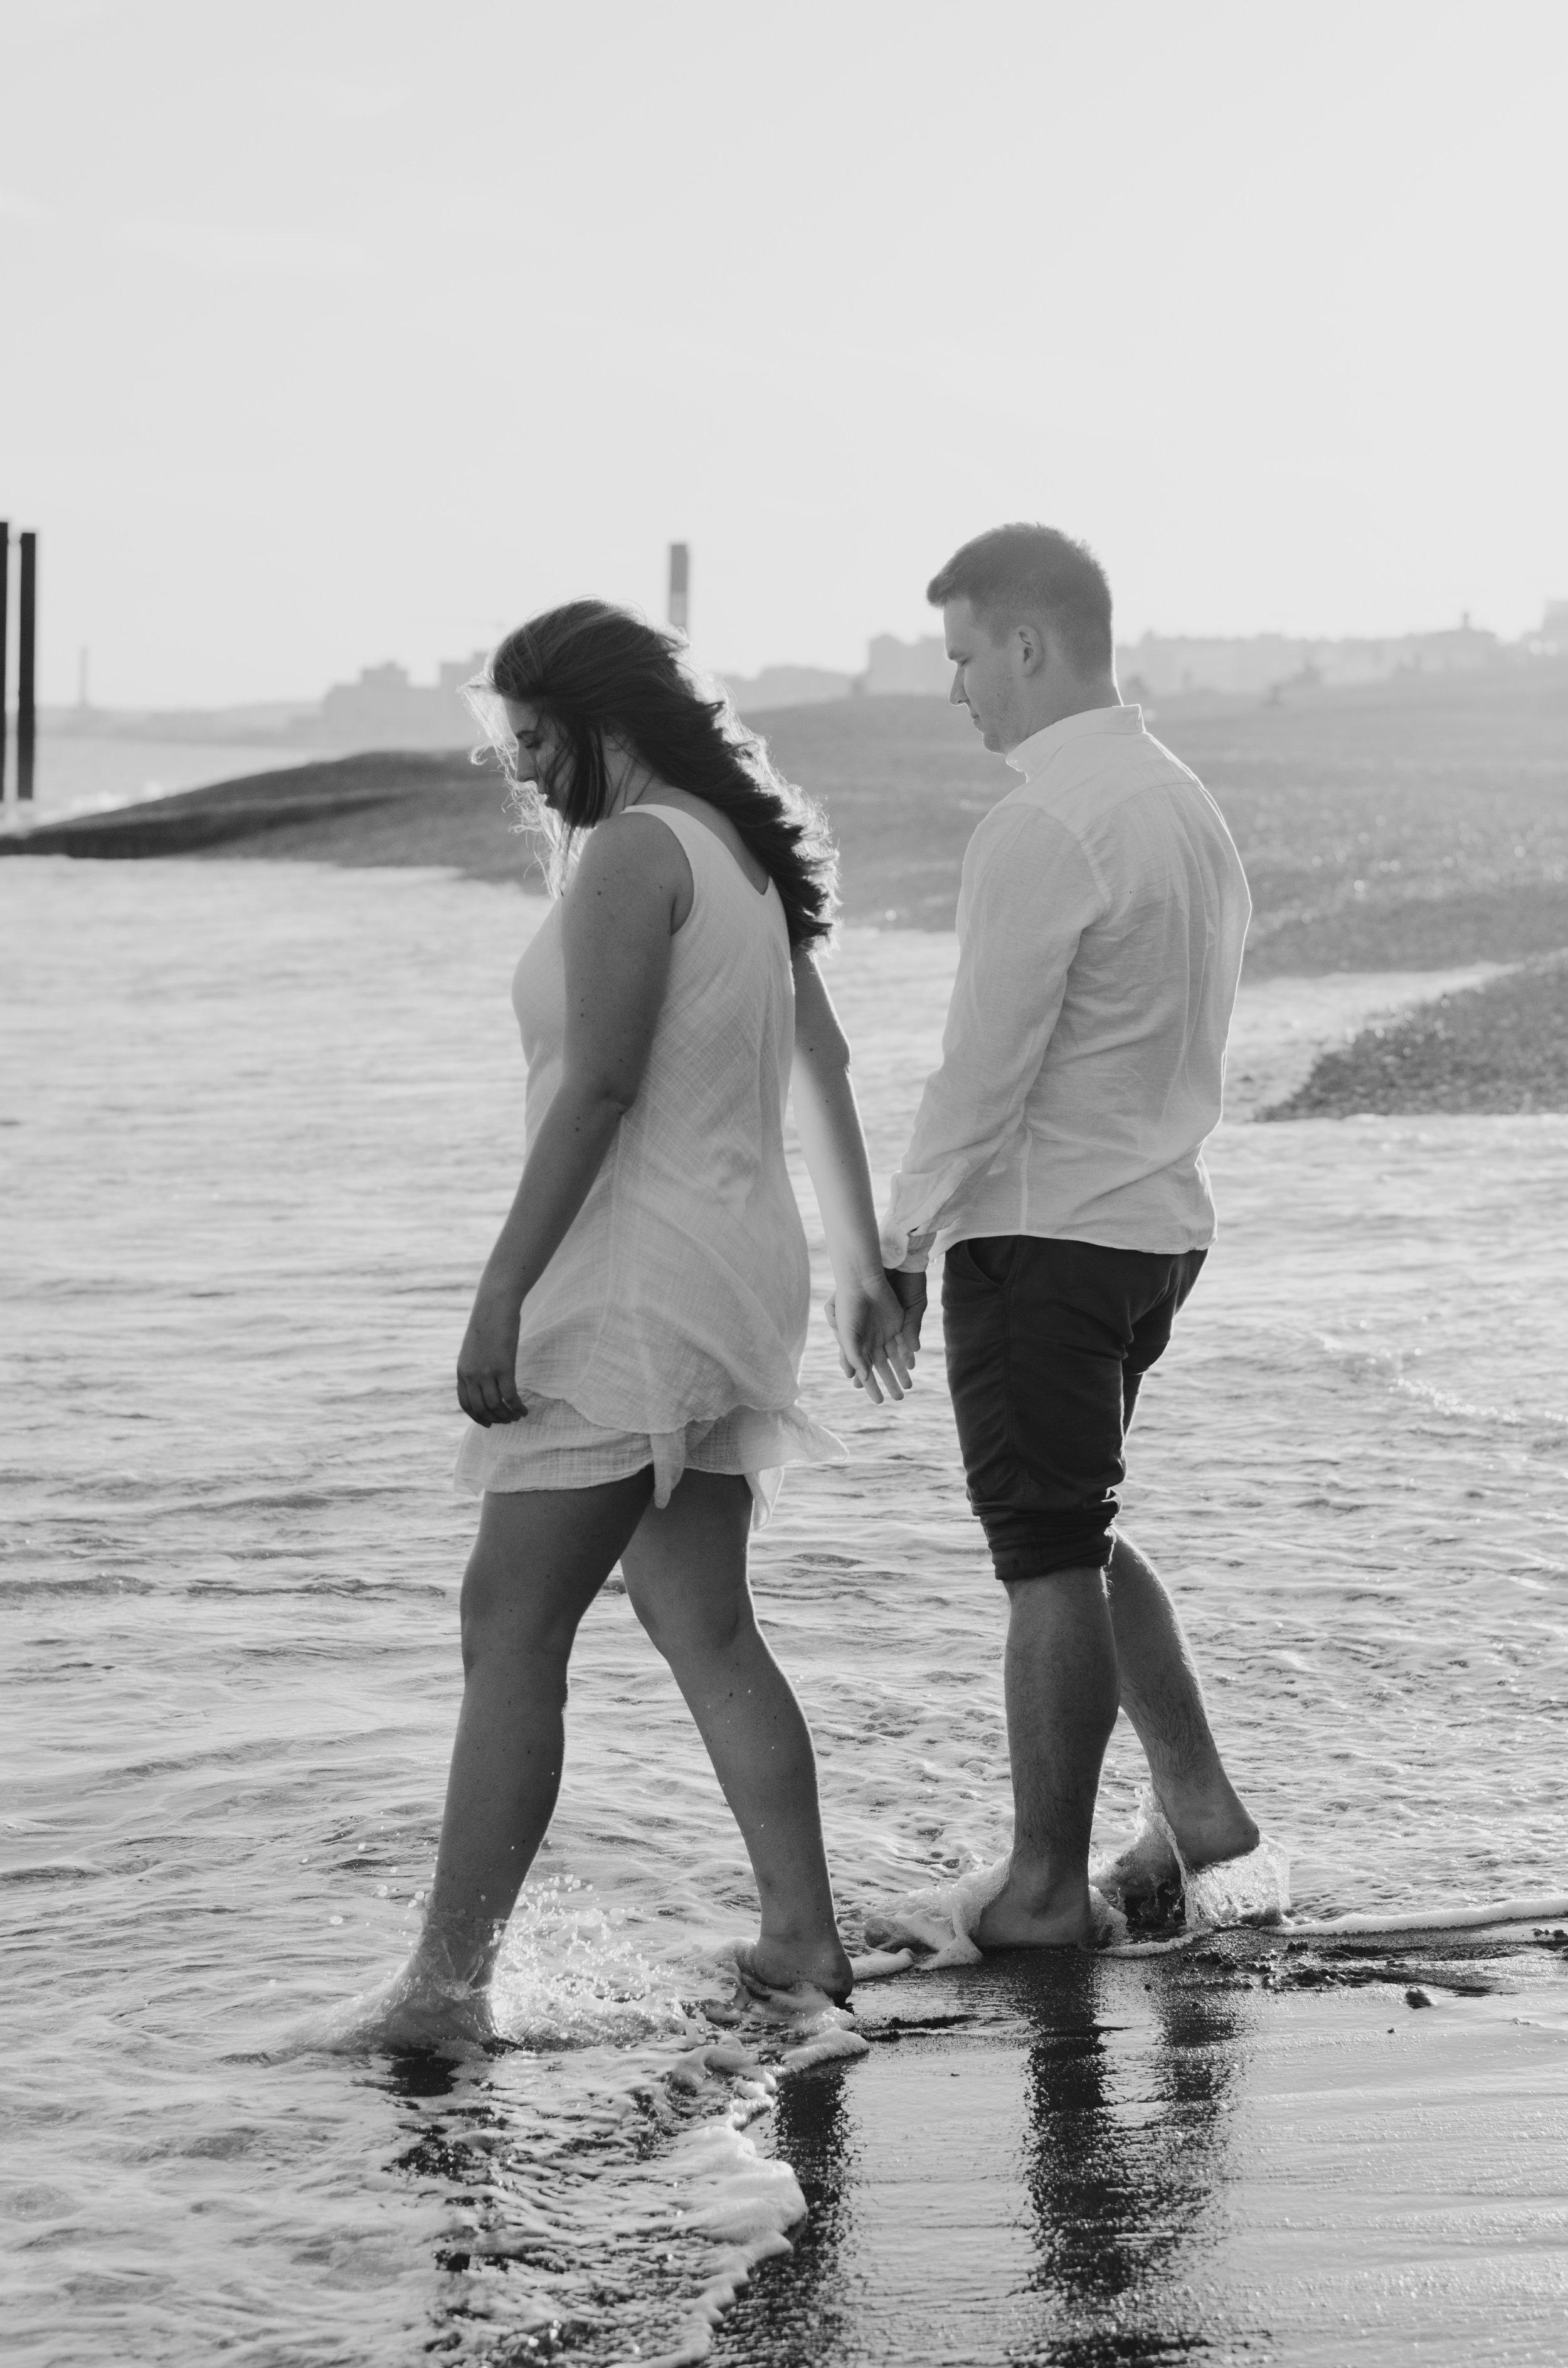 Ieva & Julius - Brighton Beach - Couple Session - Aiste Saulyte Photography-33.jpg